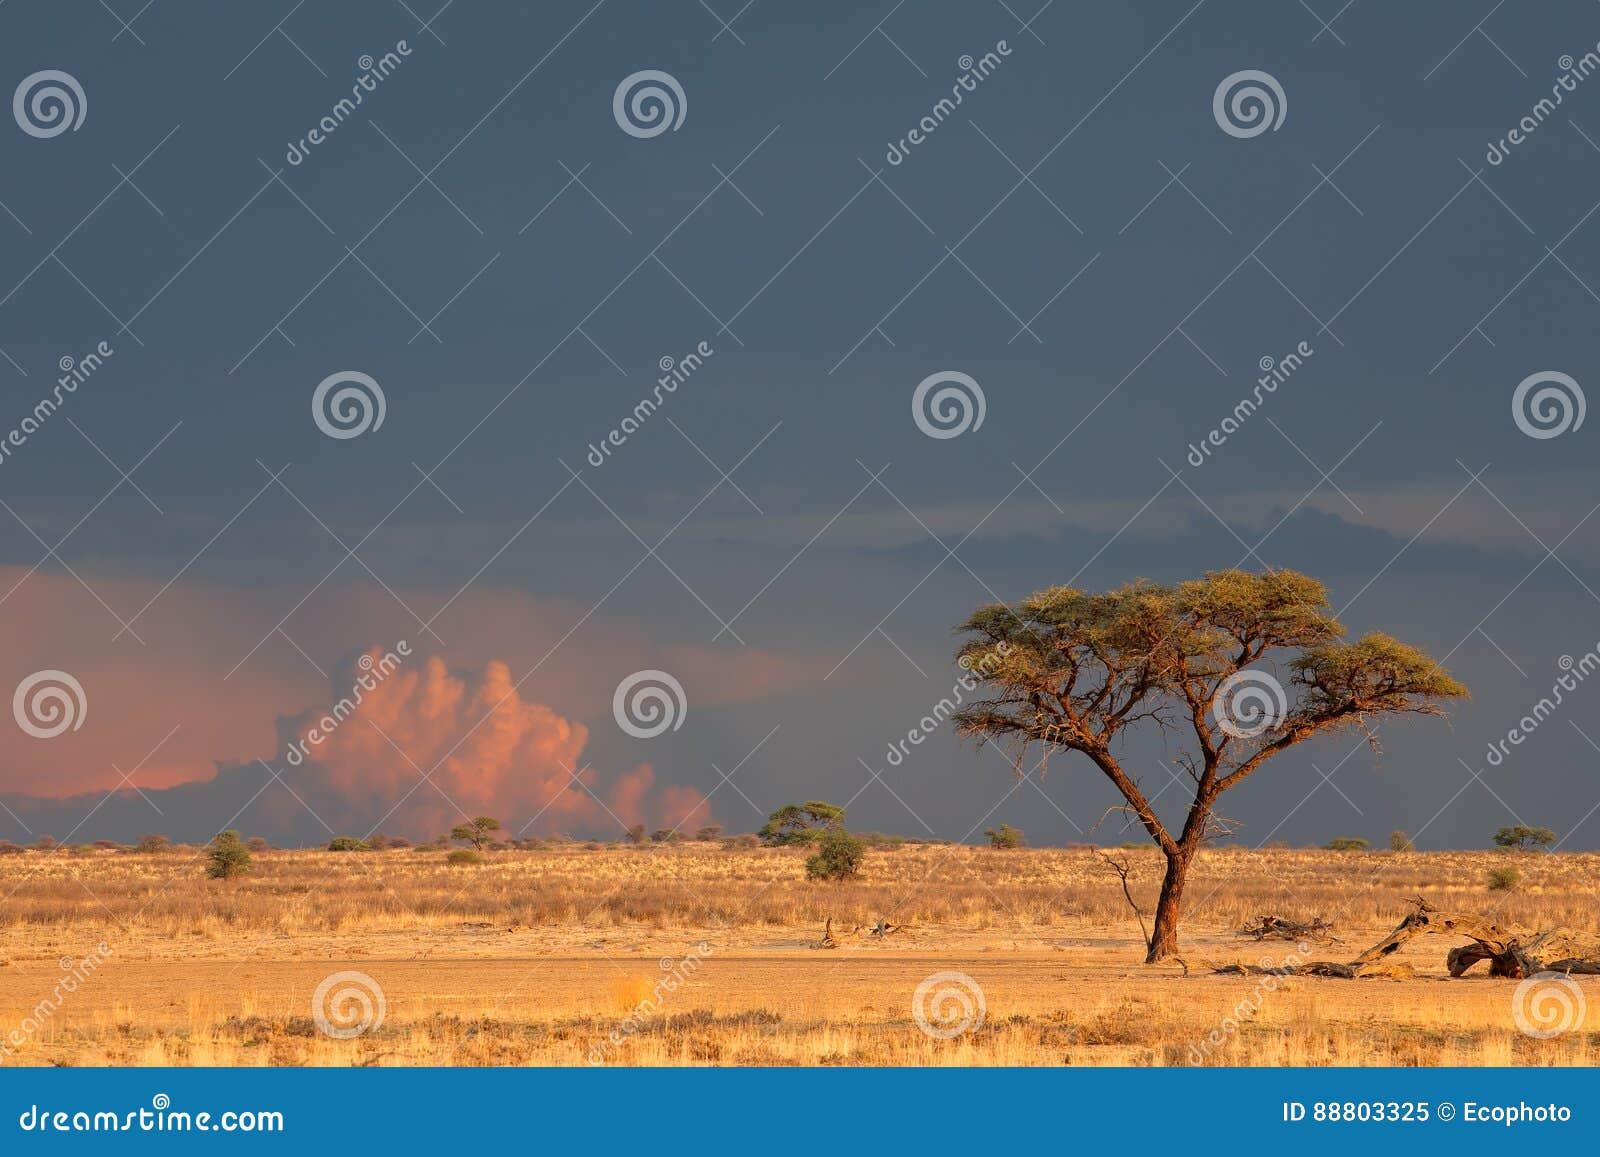 Paesaggio di deserto del Kalahari